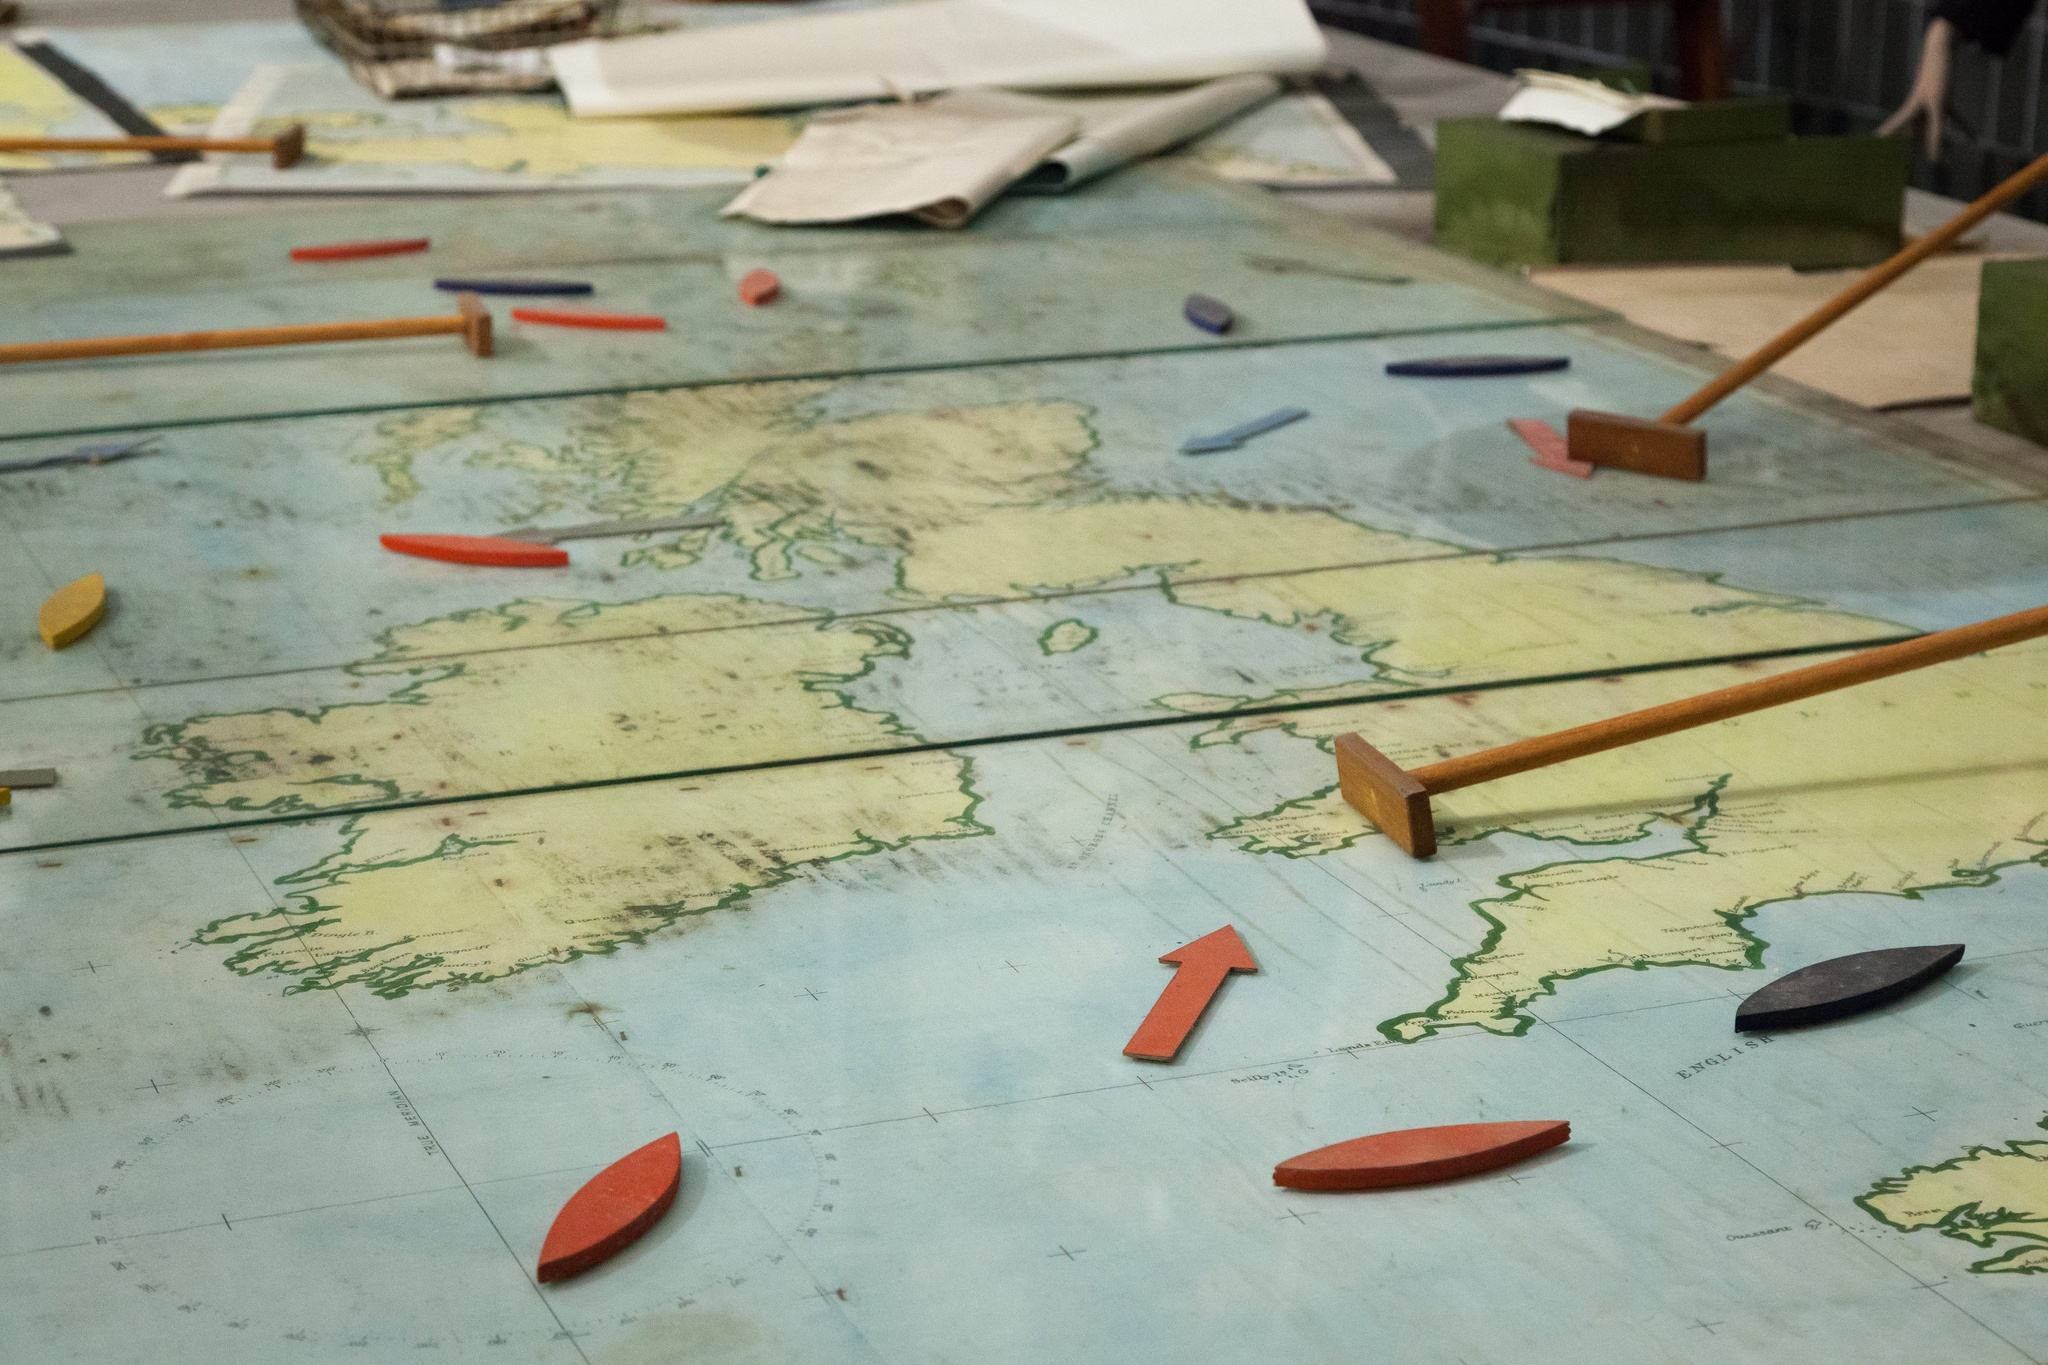 WW2 Operations Room